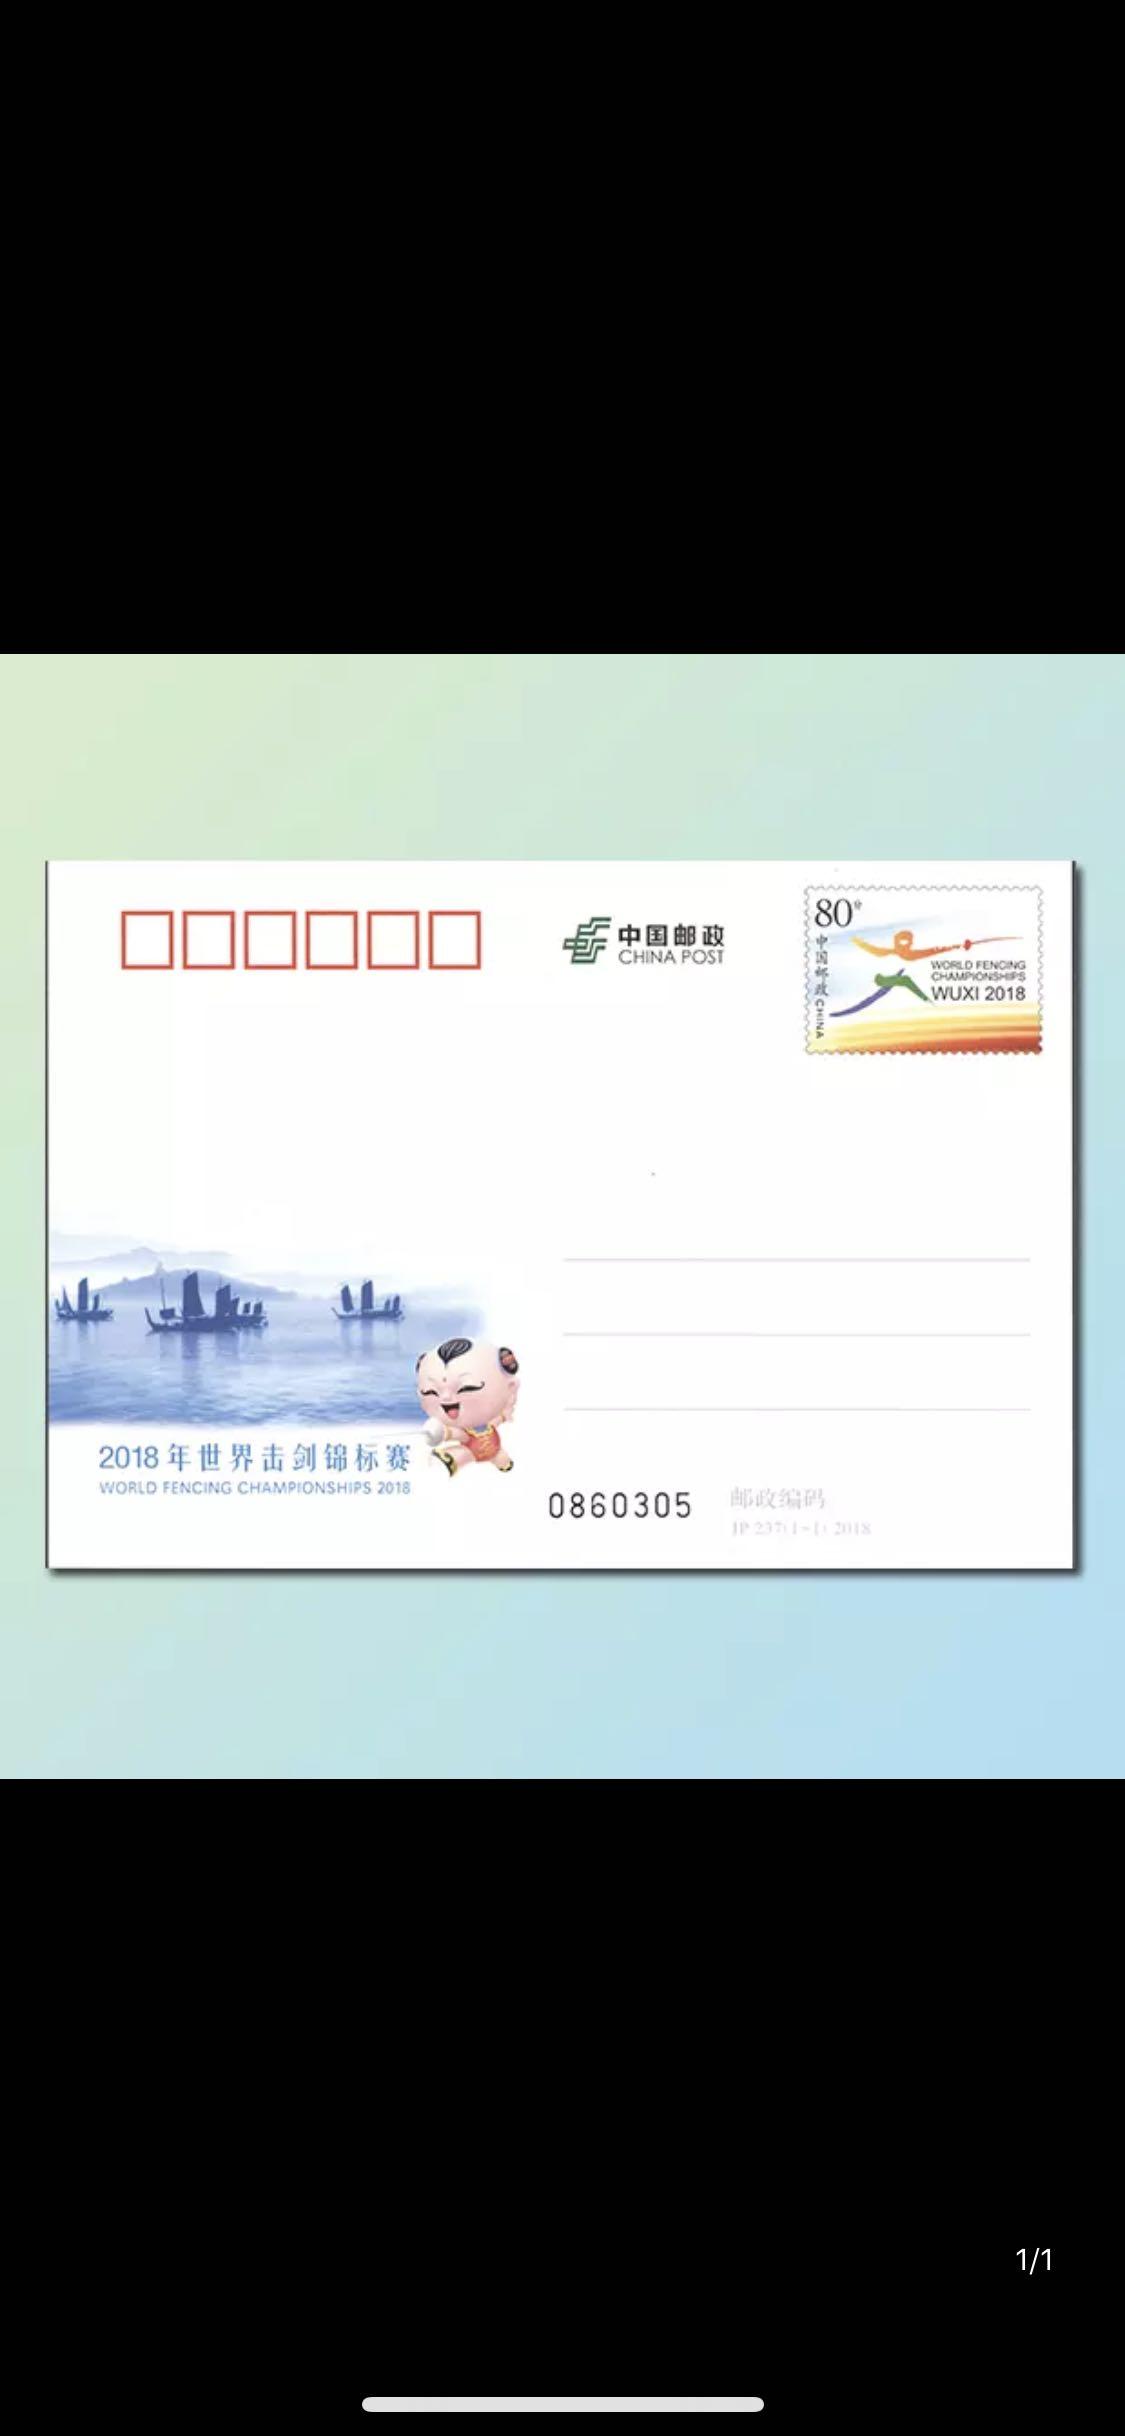 JP237世界击剑锦标赛纪念邮资明信片全新全品2018 Изображение 1